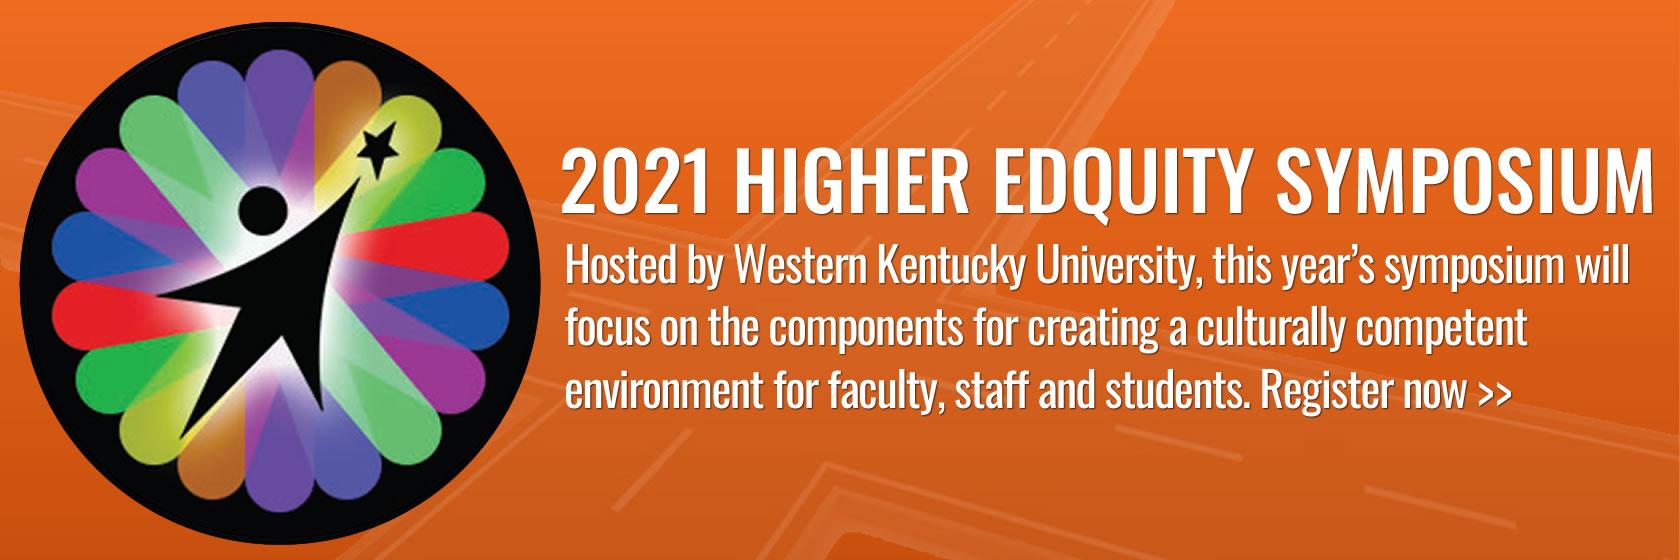 Register now for CPE's Higher EDquity Symposium